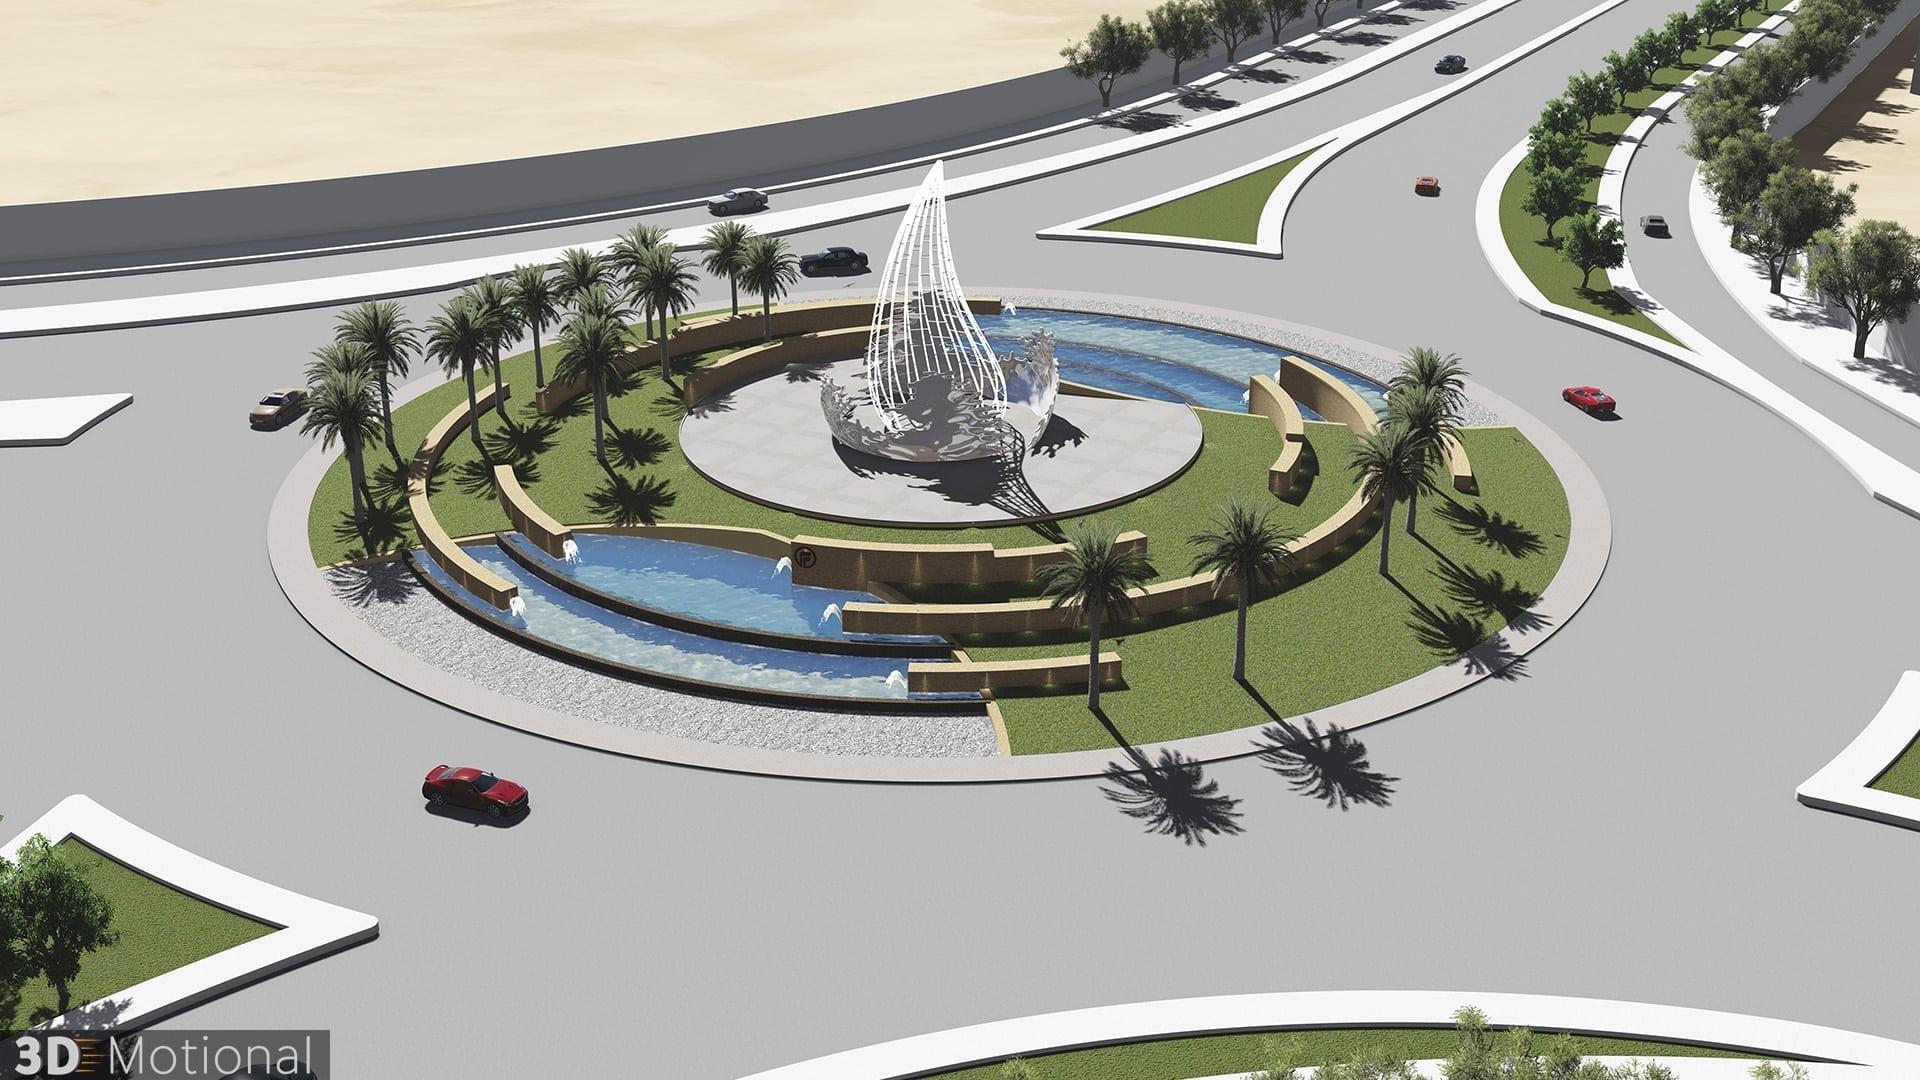 Al Fozan-Roundabout-khobar (4)